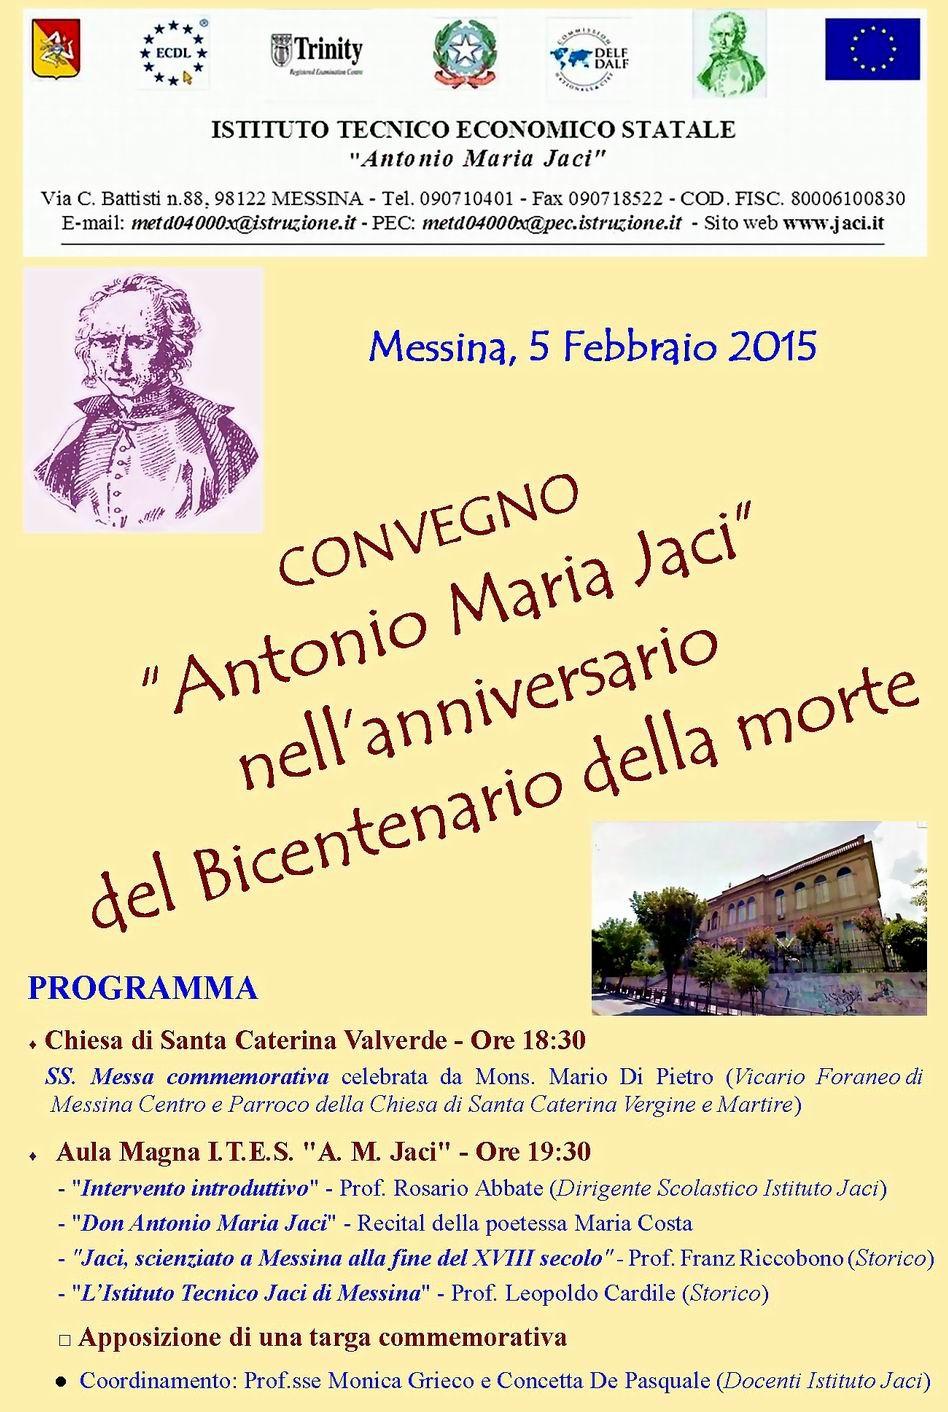 Manifesto Bicentenario A.M. Jaci